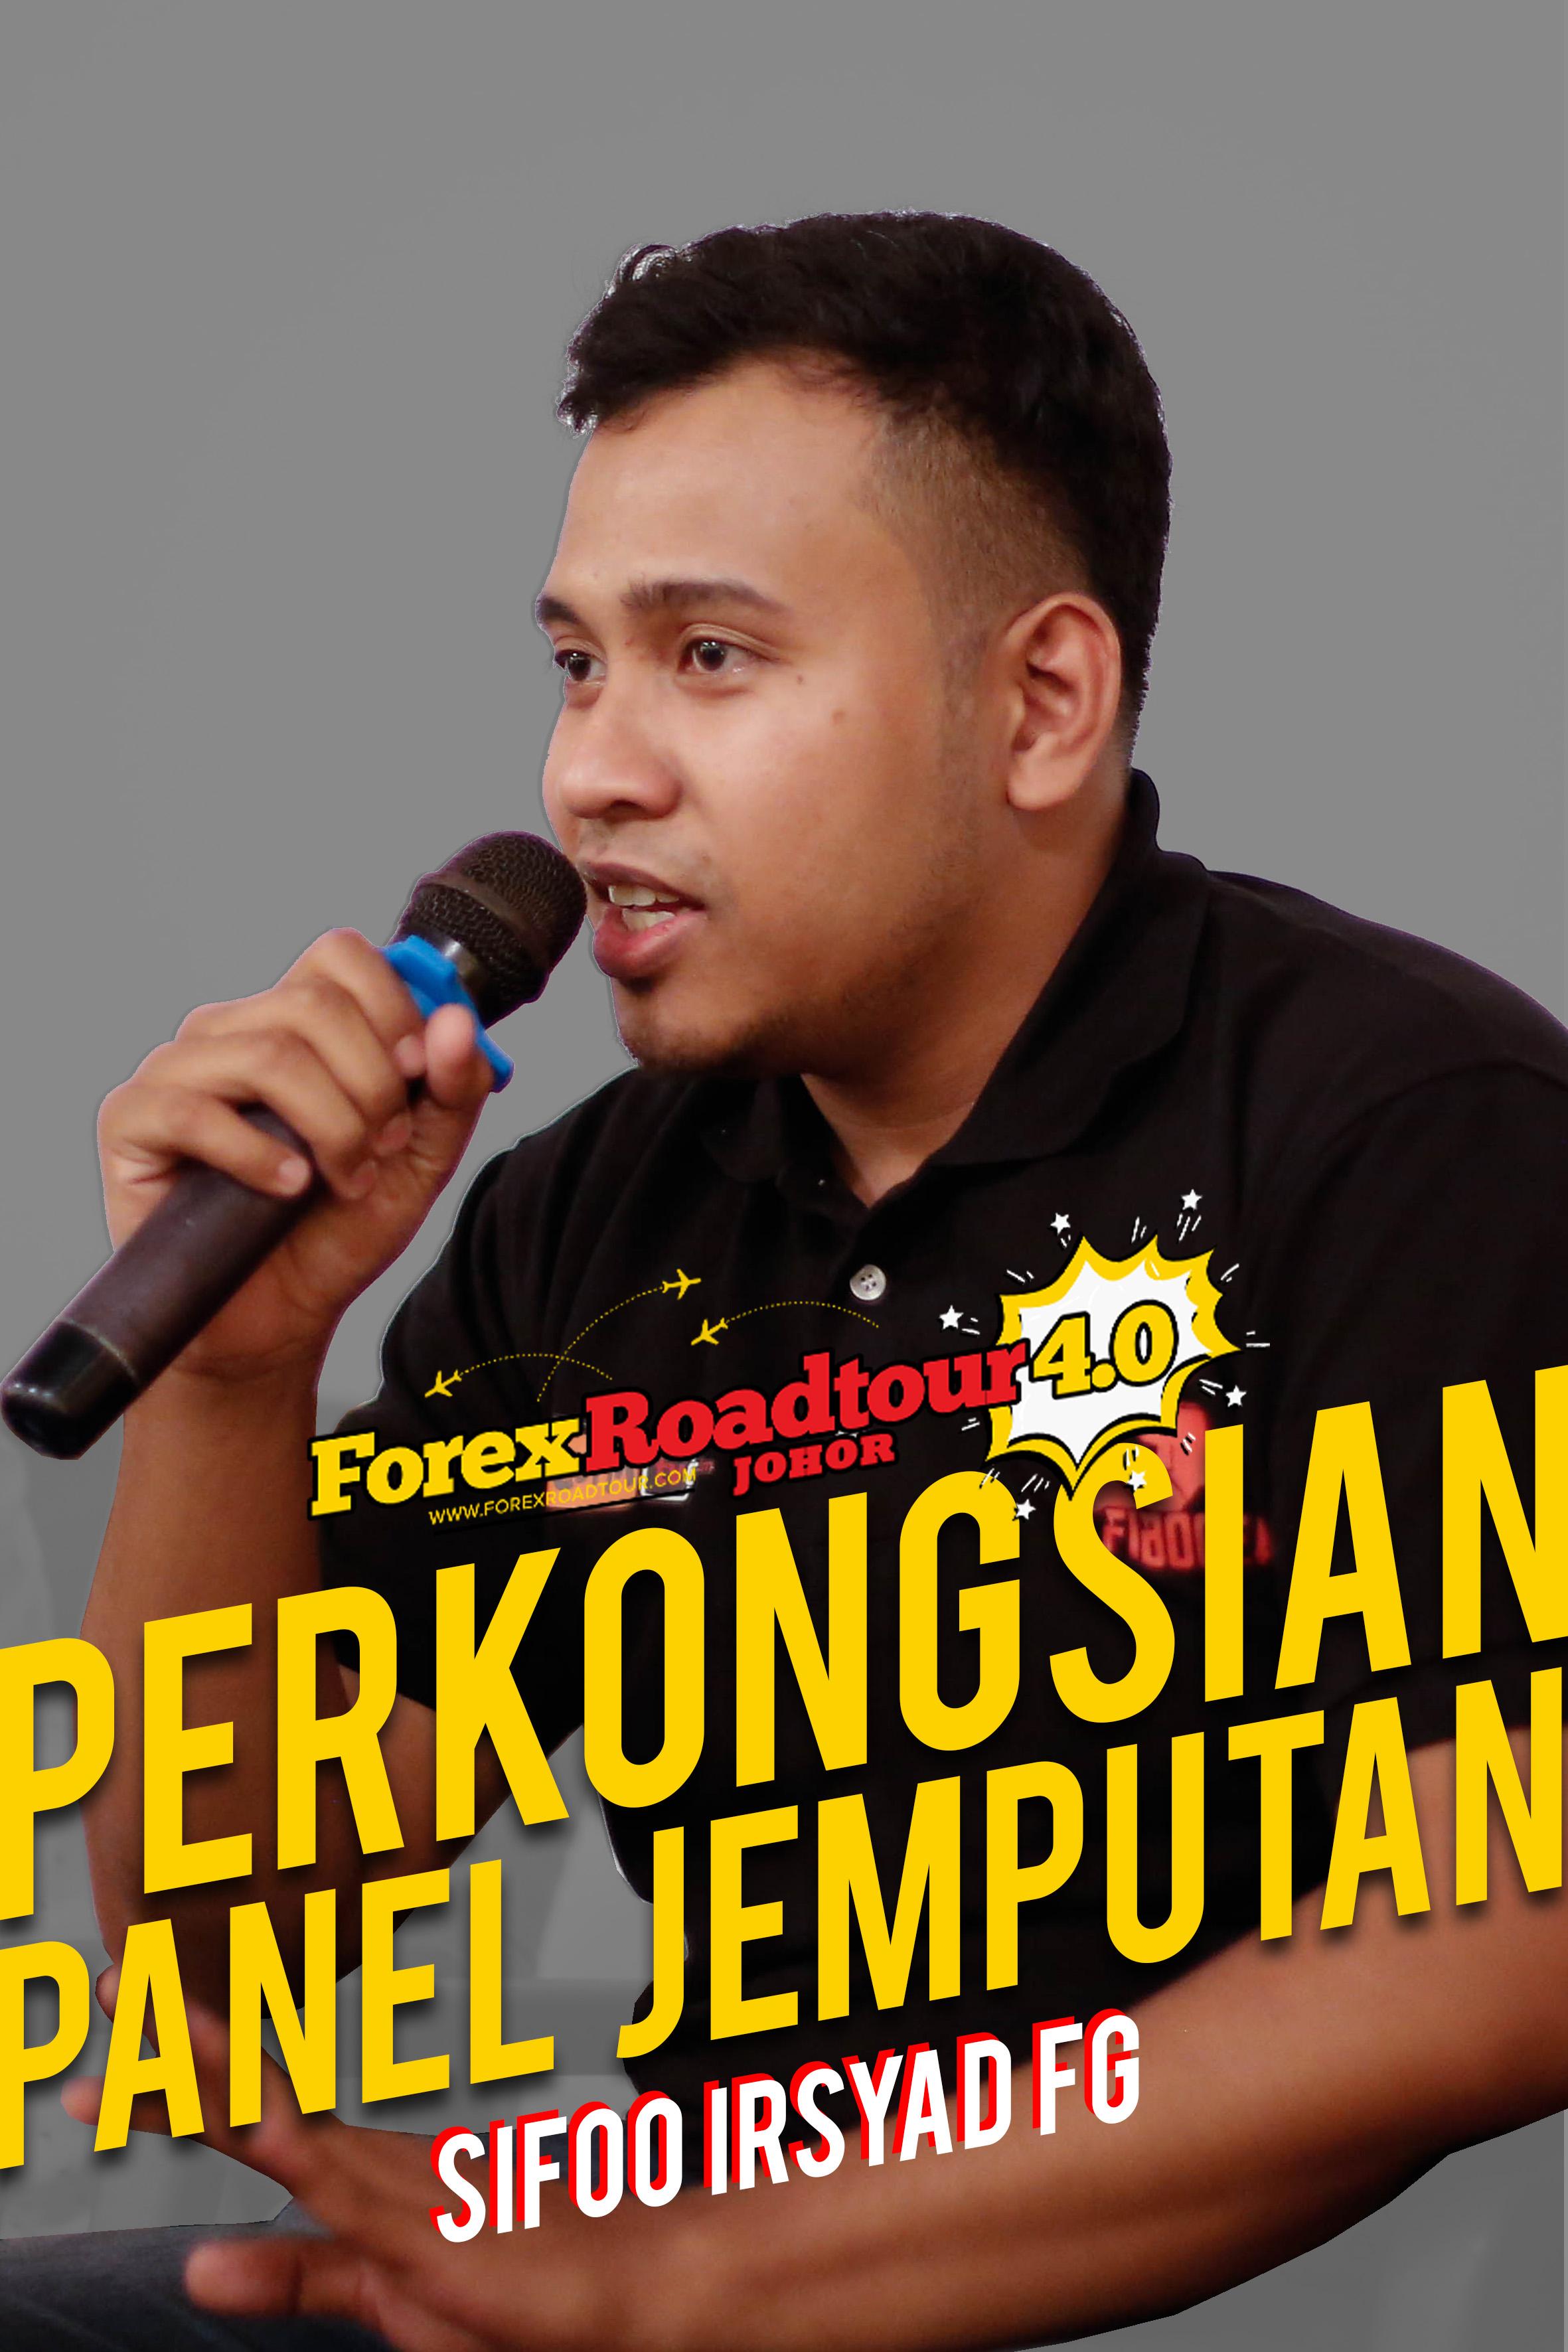 Sifoo Irsyad FG [Forex Road Tour 4.0 Johor]